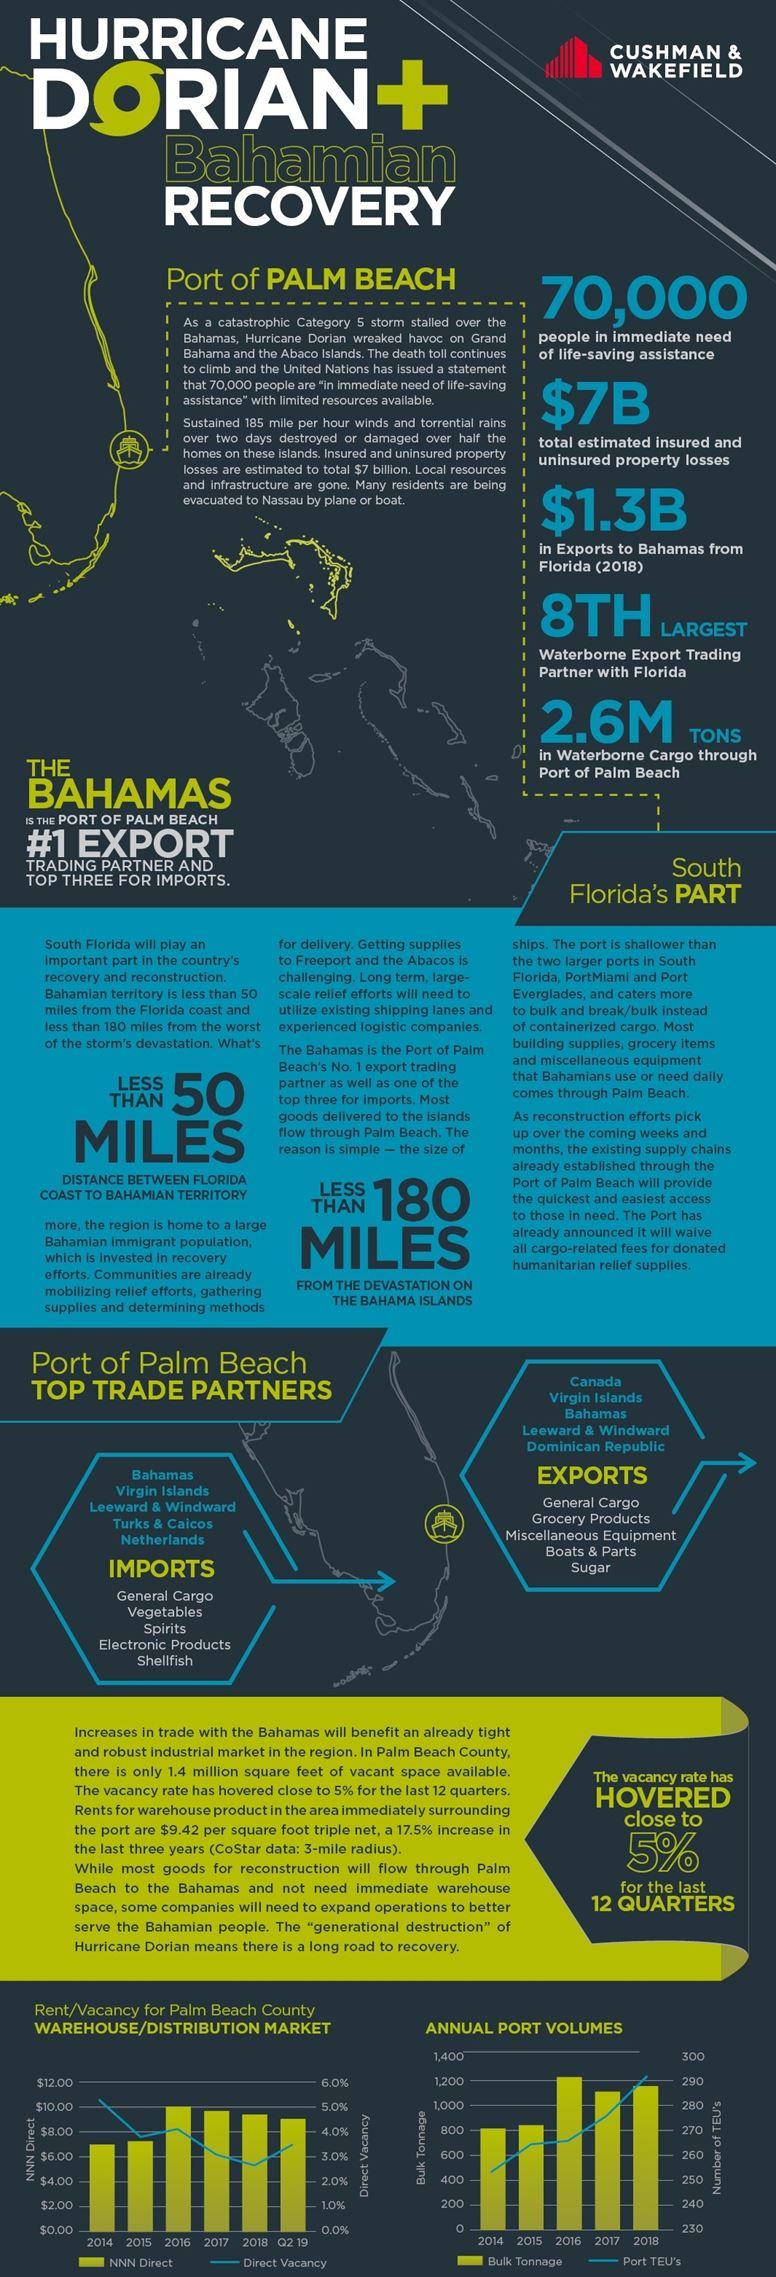 Hurricane Dorian Recovory Infographic